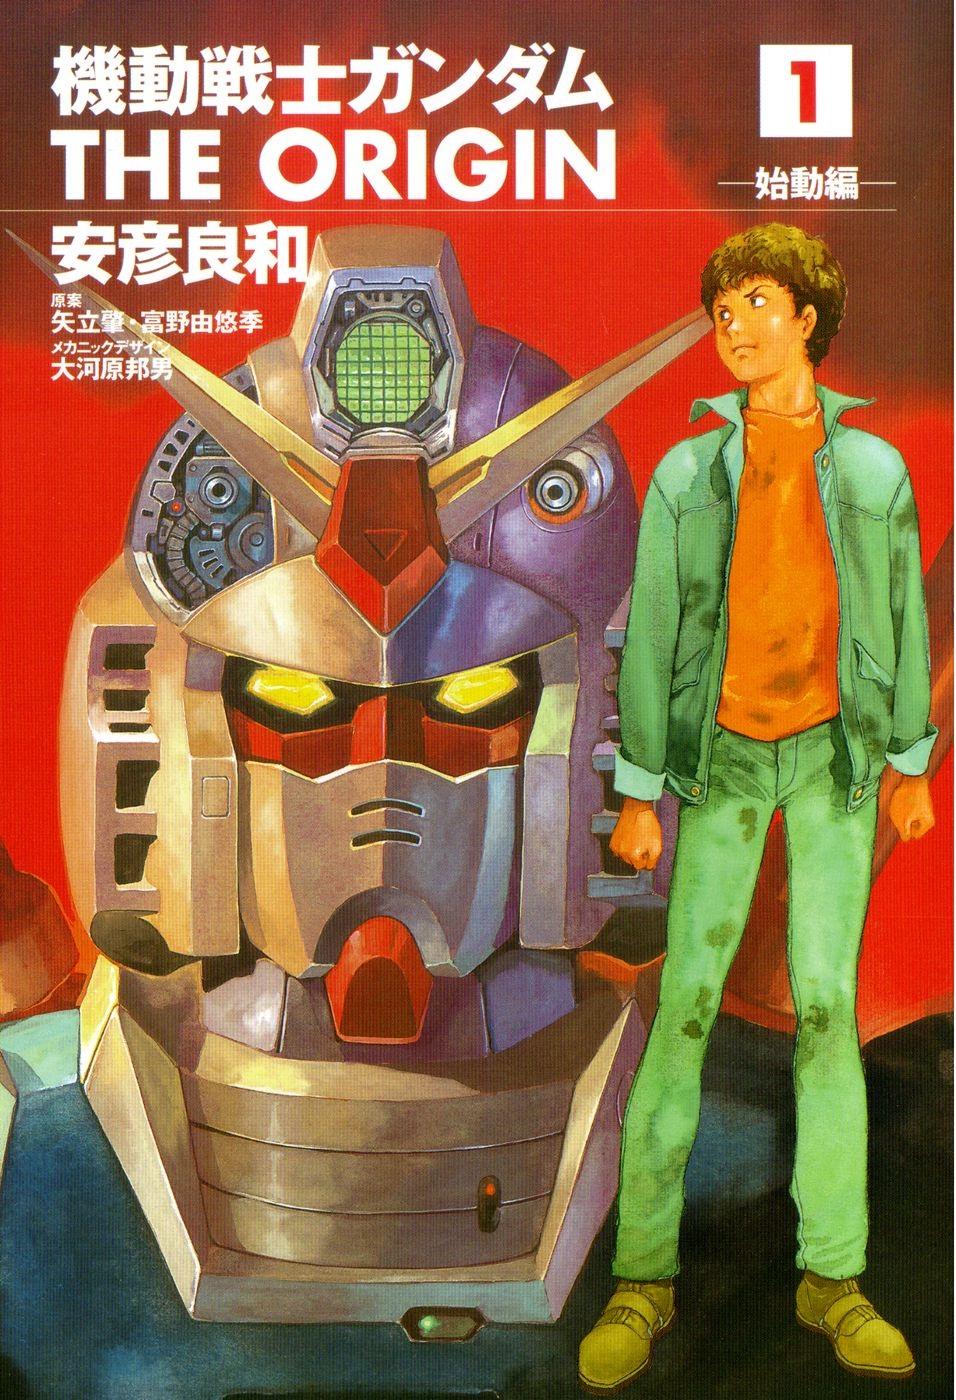 Image - Mobile-suit-gundam-the-origin-1.jpg | The Gundam Wiki | FANDOM powered by Wikia